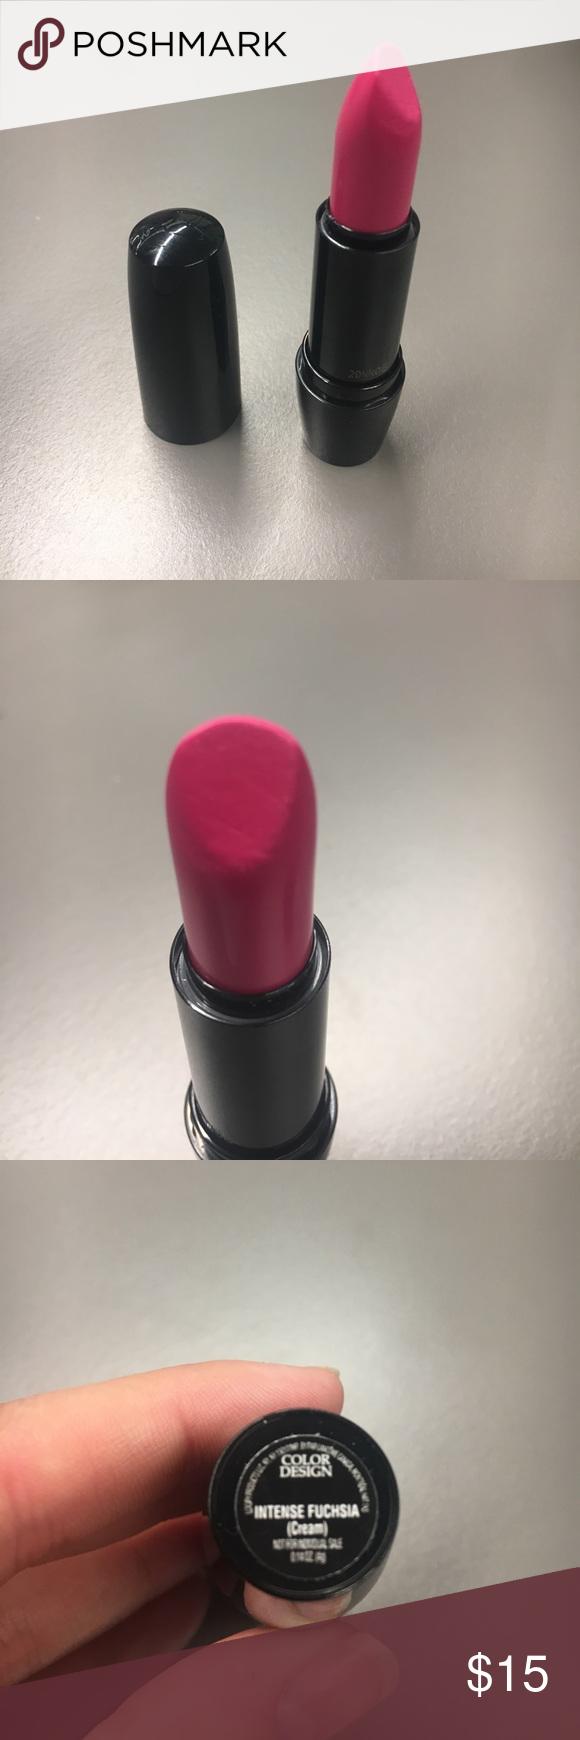 Lancôme lipstick duo lipstick, Sephora makeup